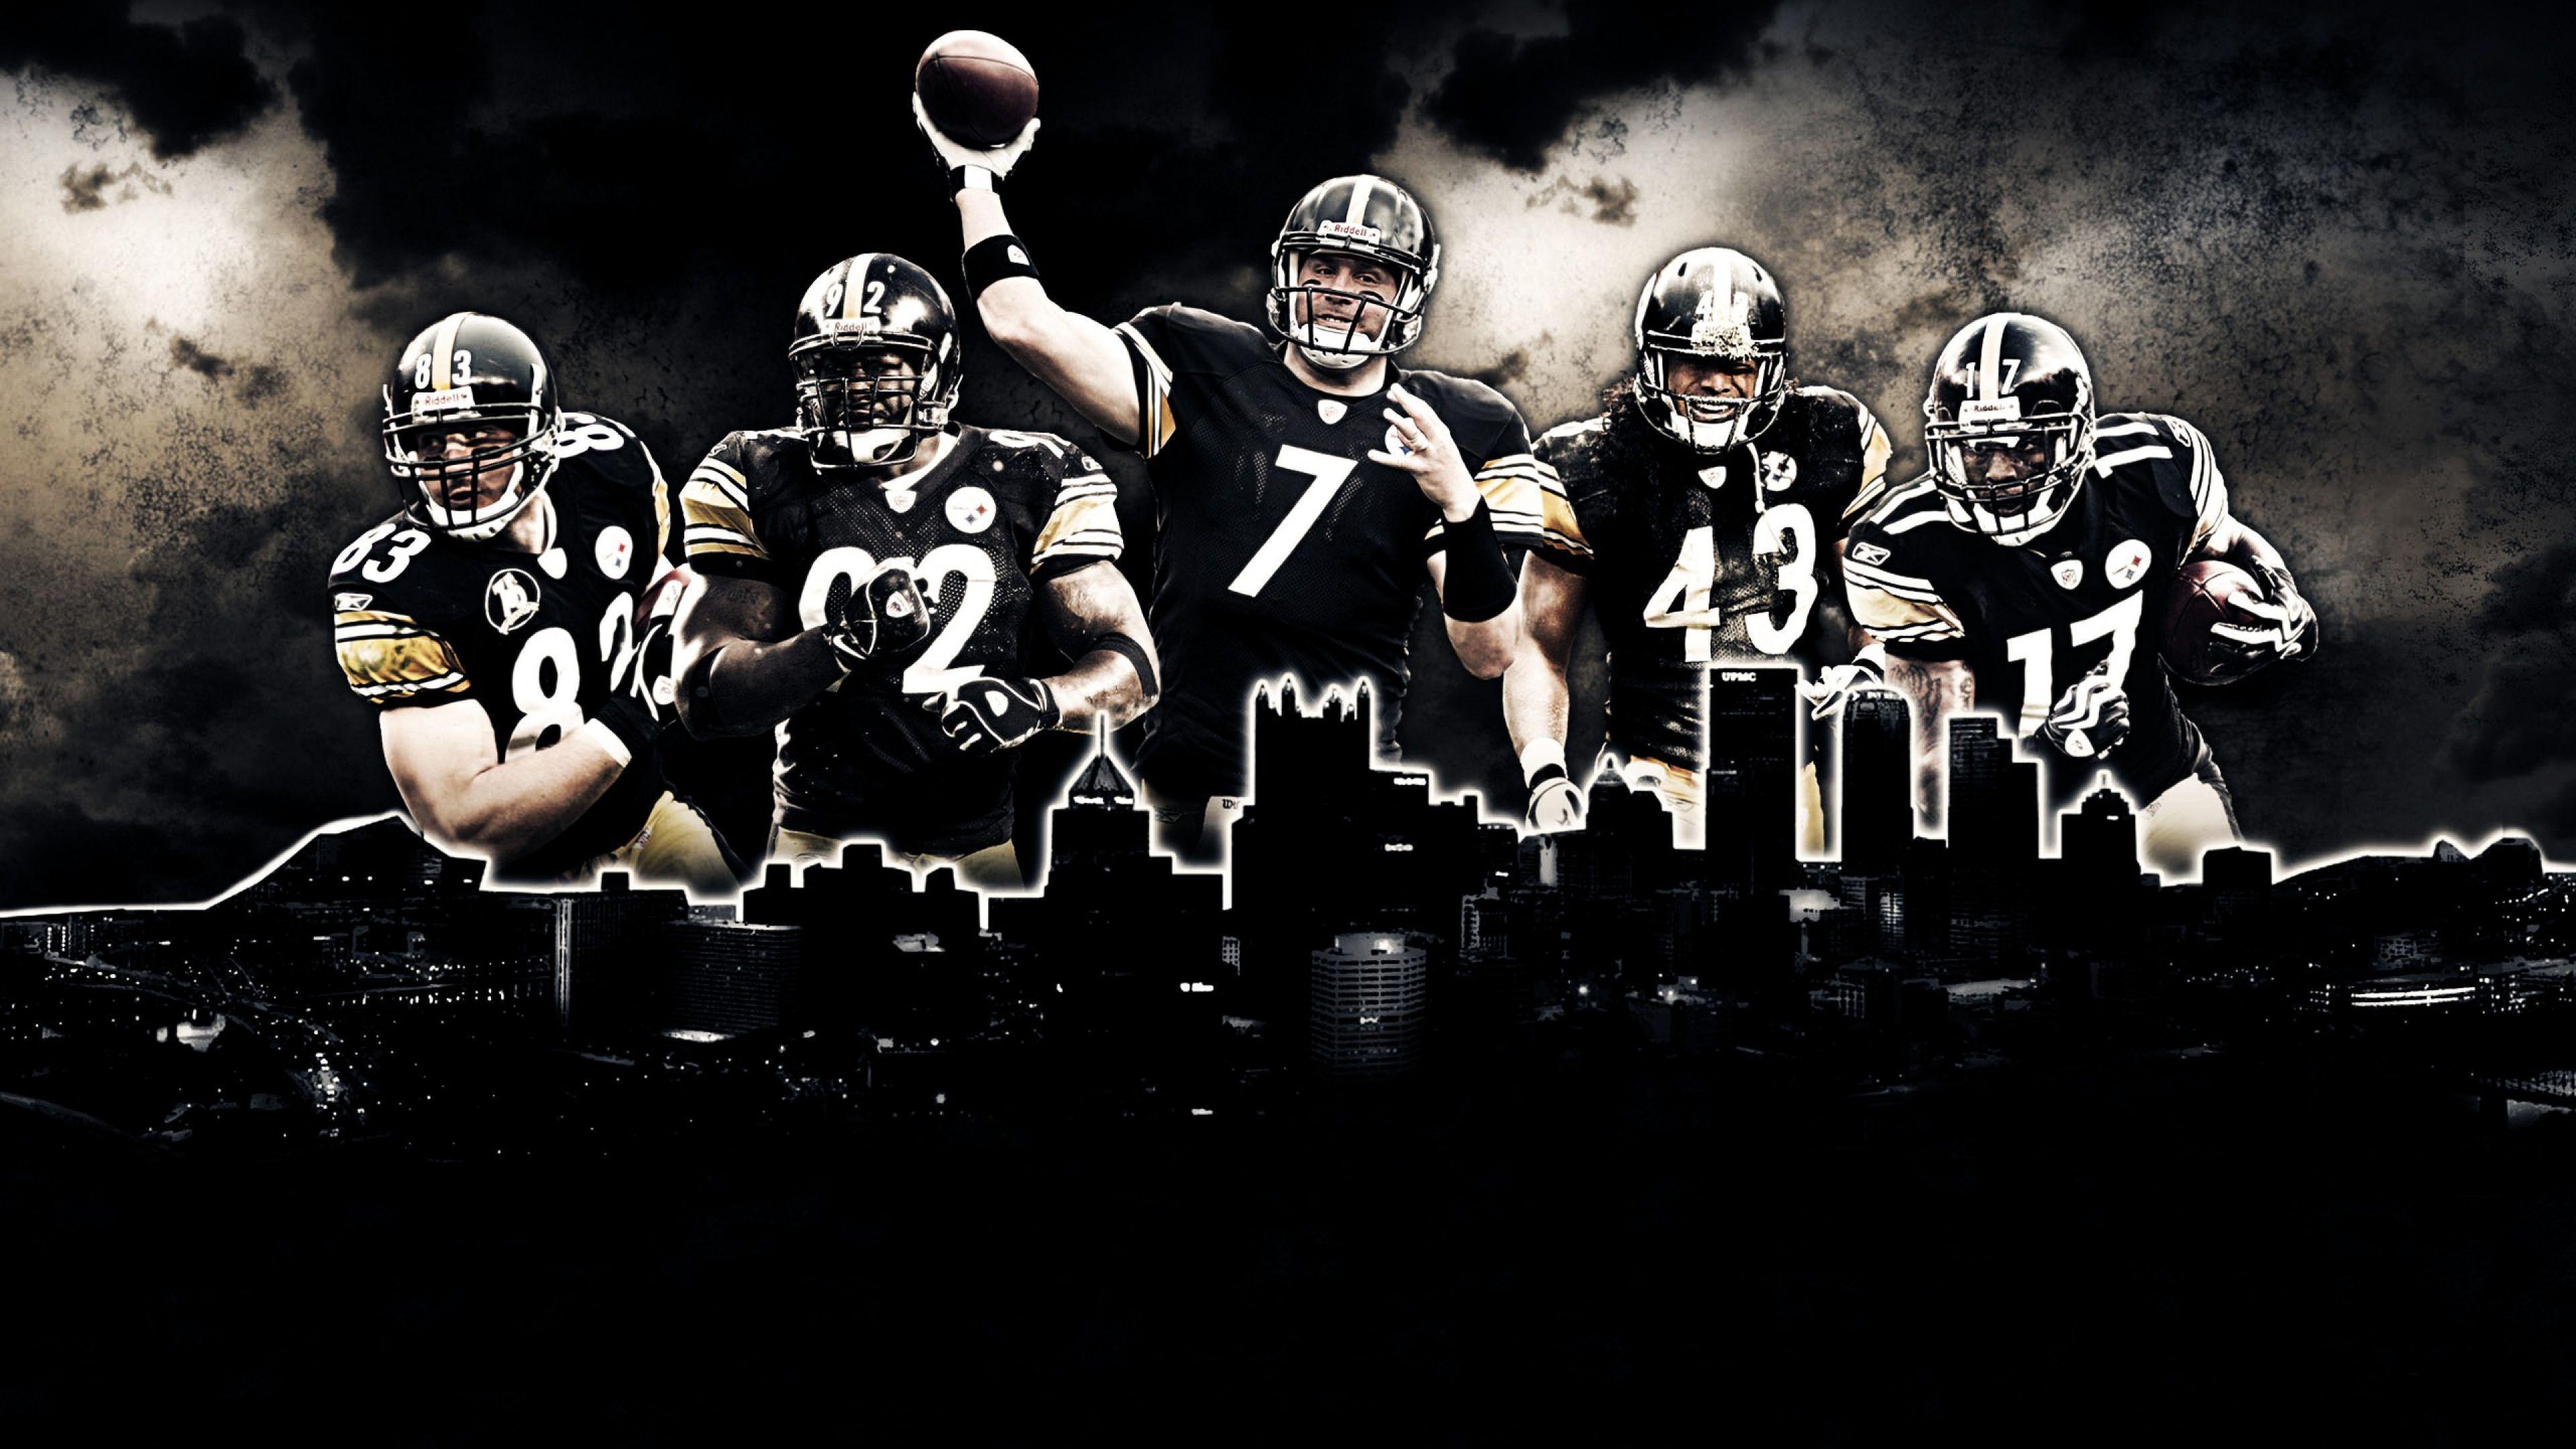 Steelers Wallpapers 2016